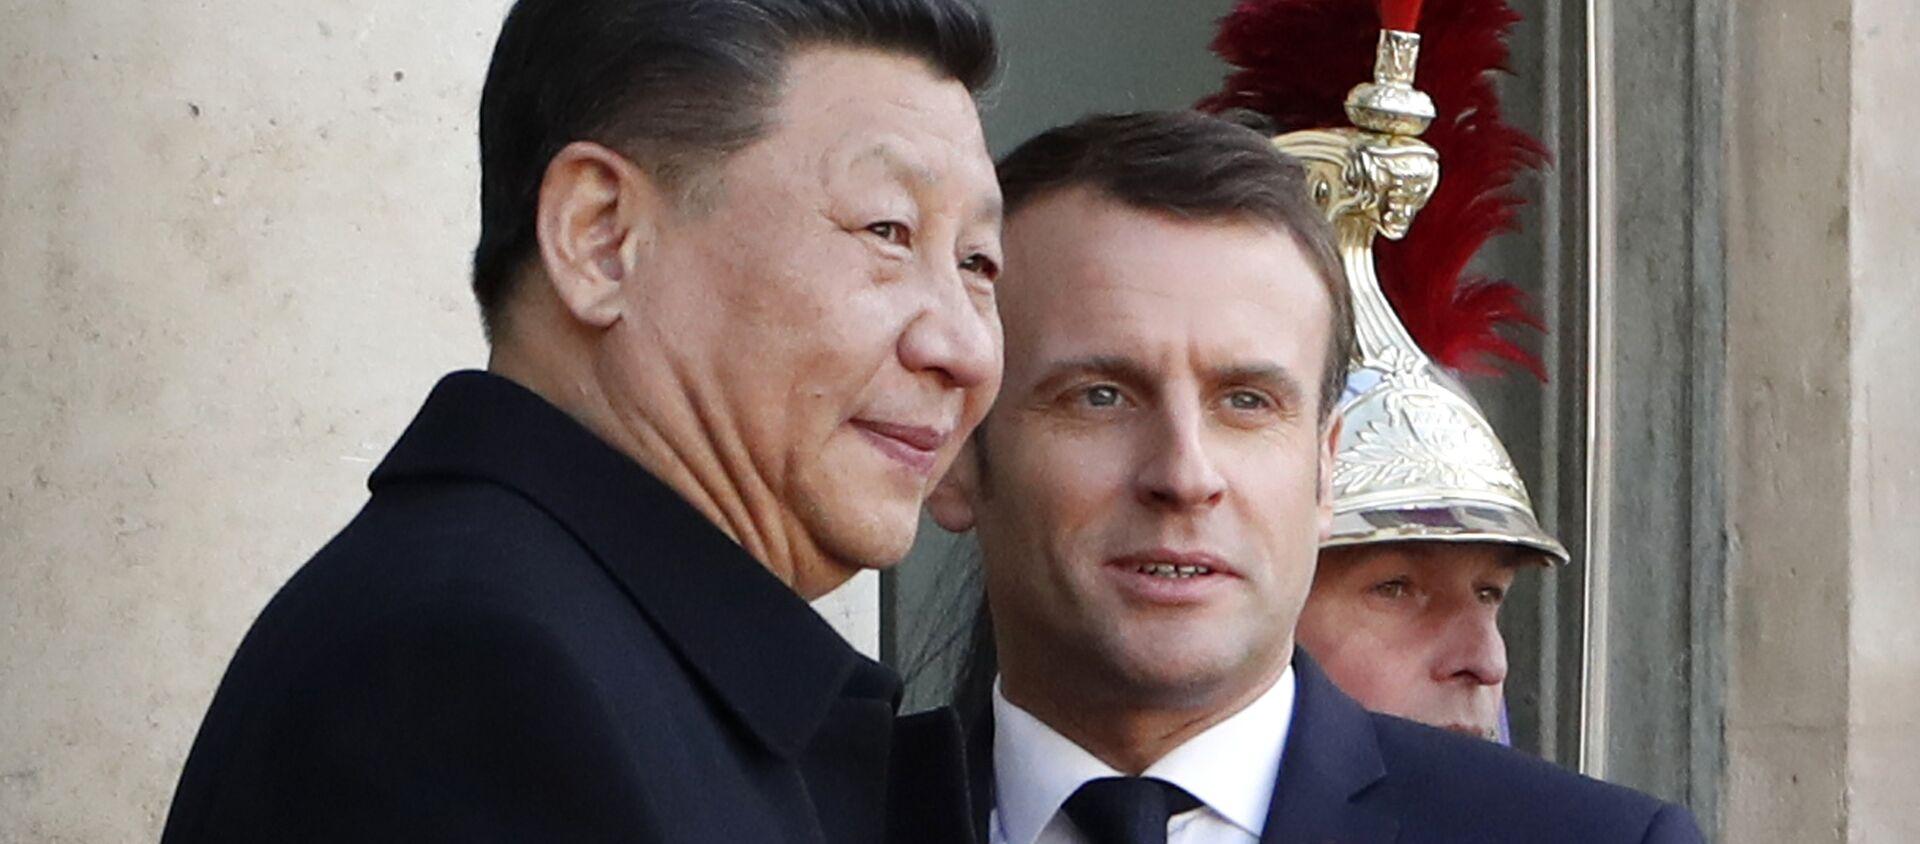 Emmanuel Macron et Xi Jinping - Sputnik France, 1920, 24.11.2020